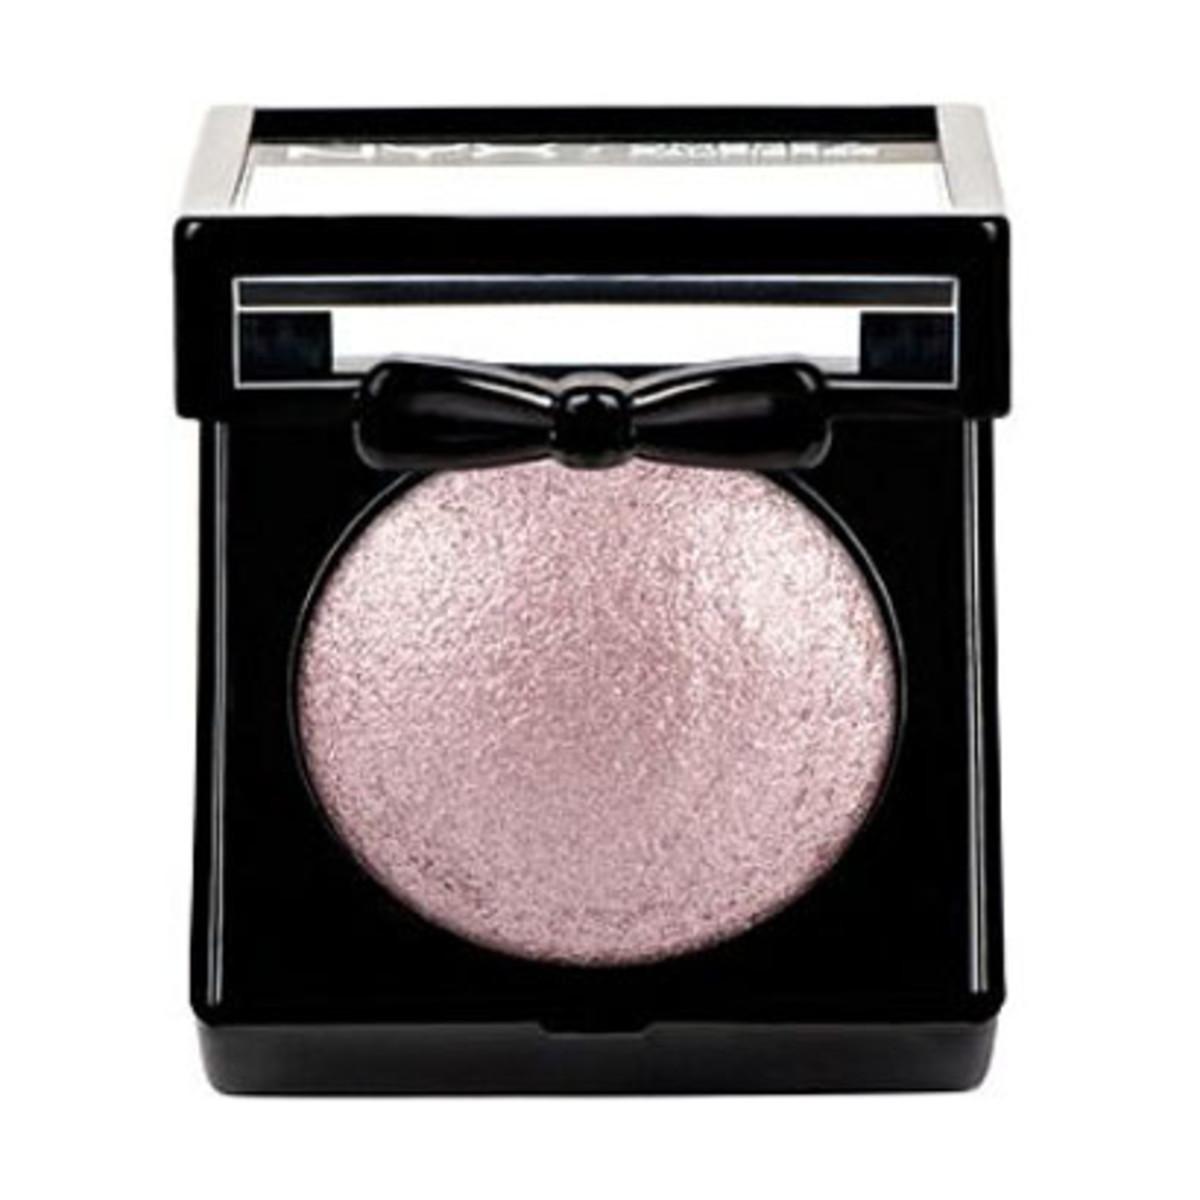 NYX Cosmetics Baked Eyeshadow in Vesper